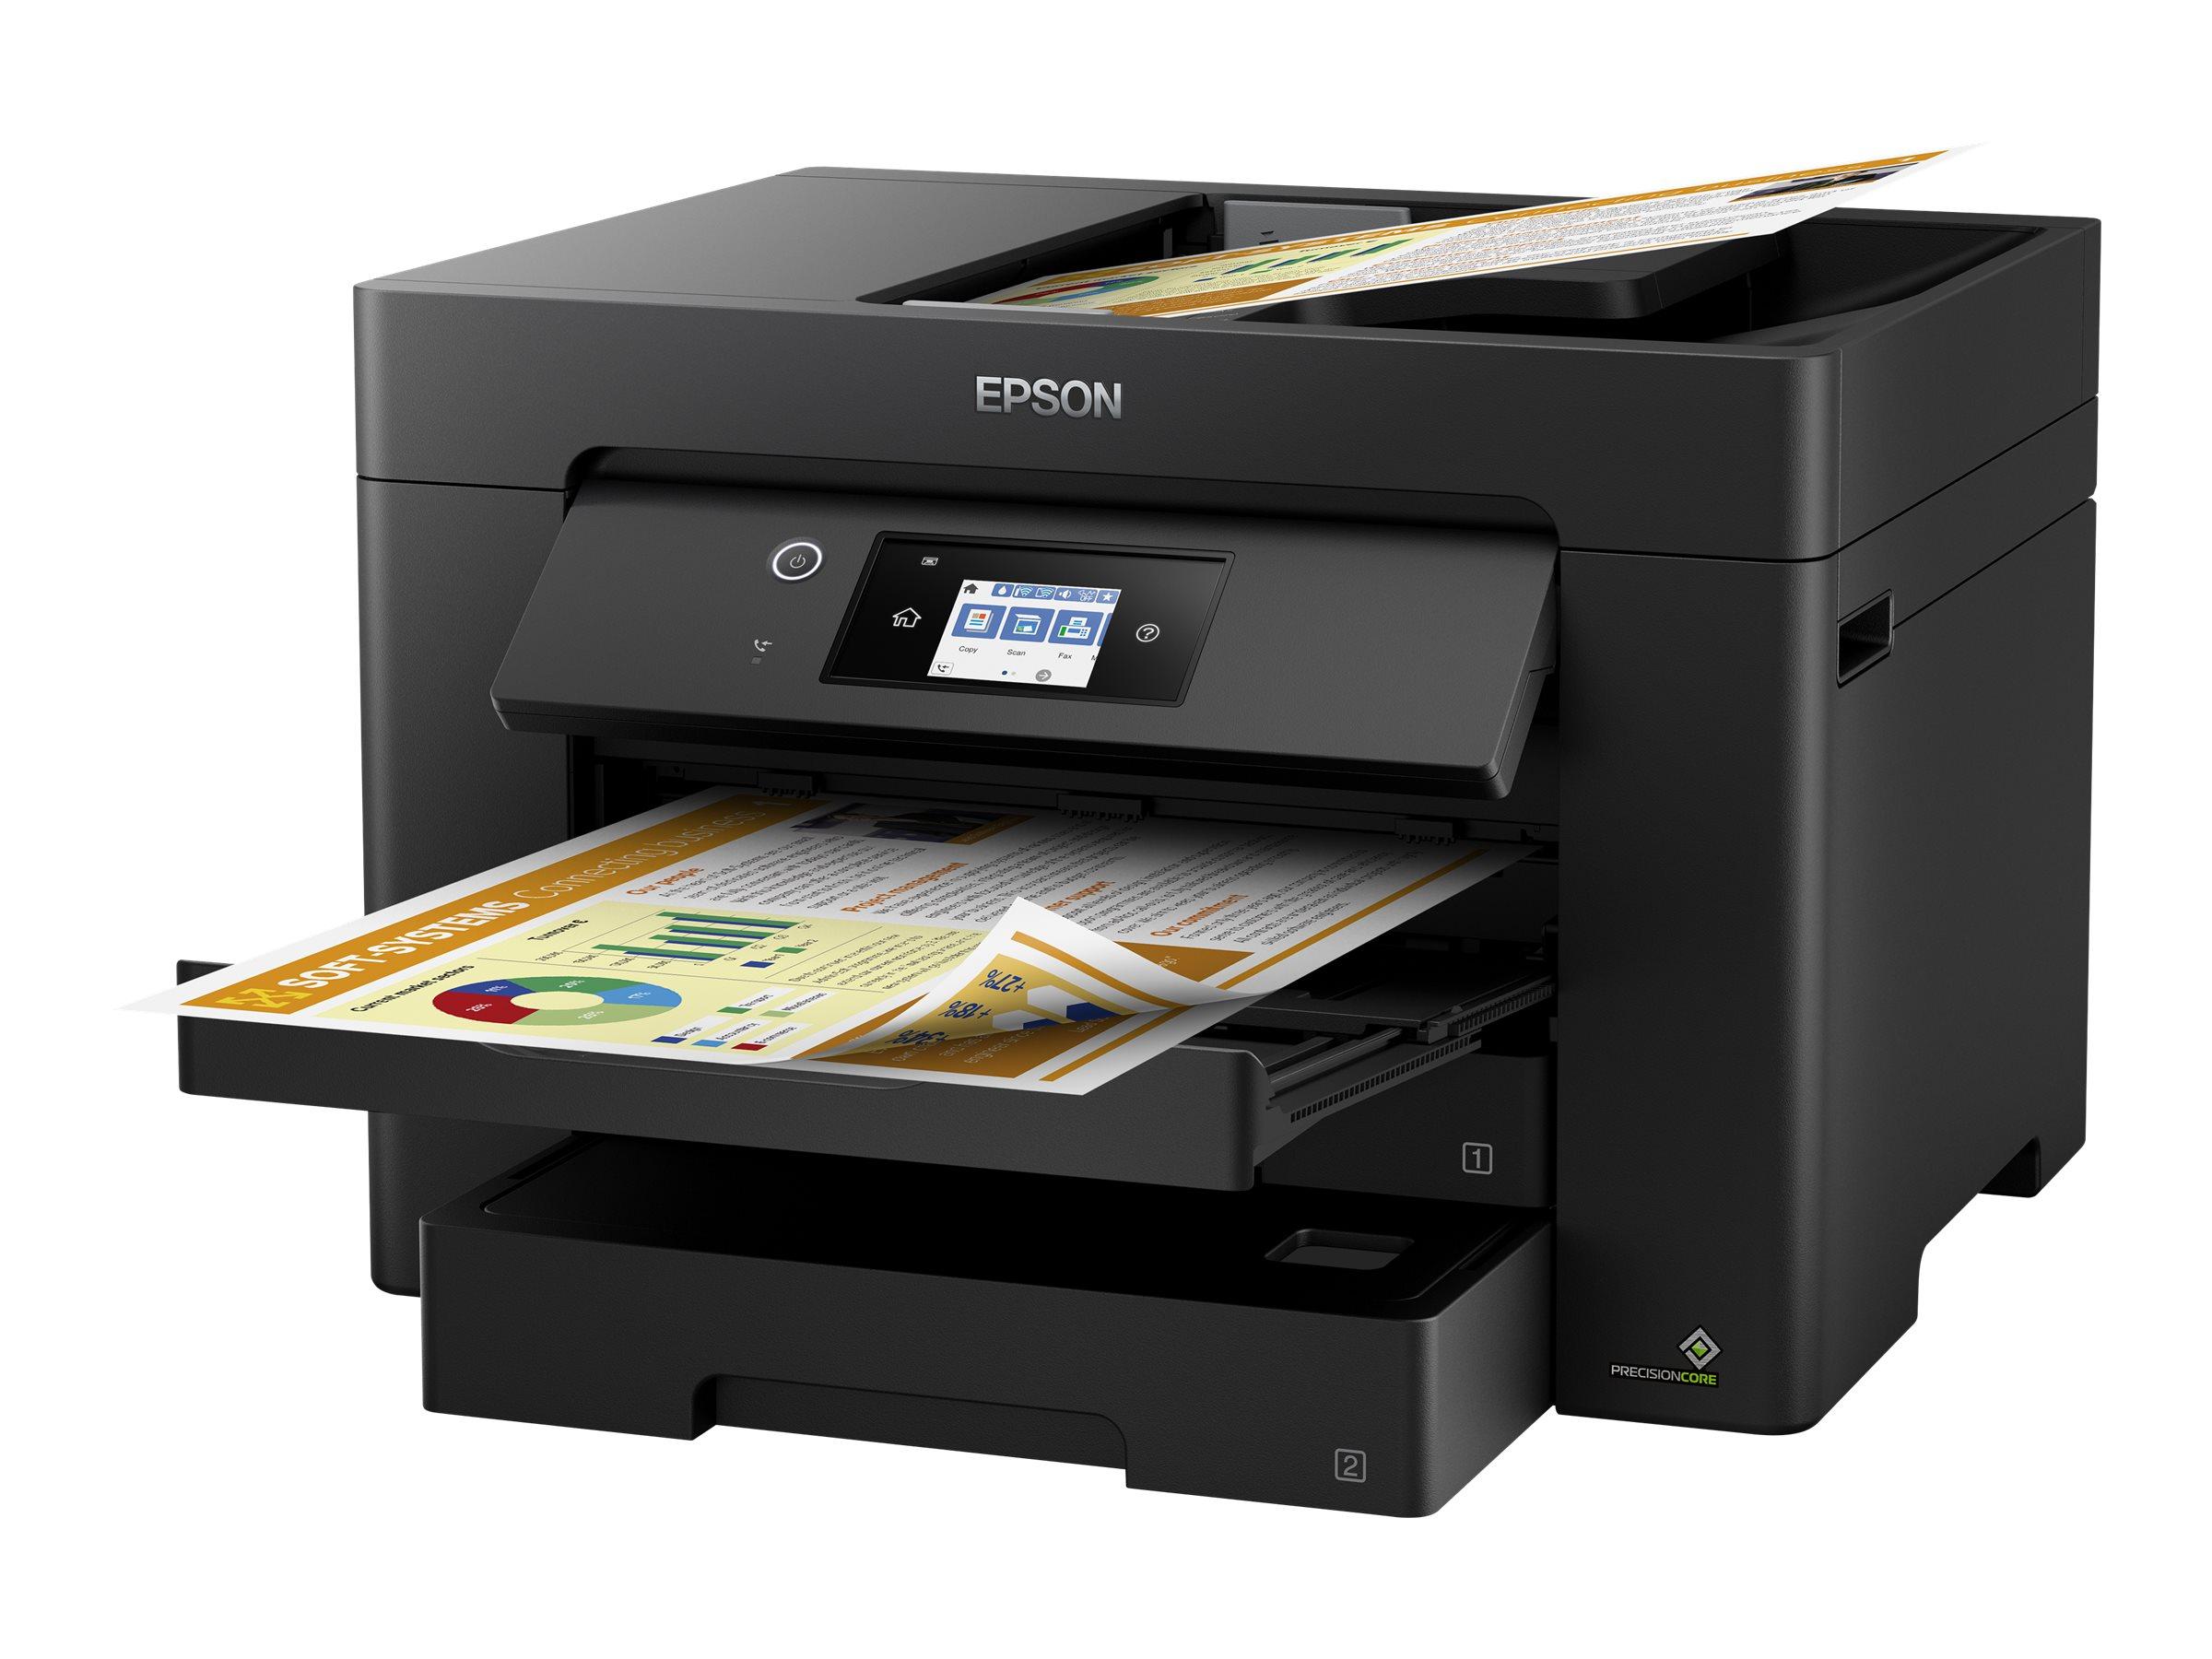 Epson WorkForce WF-7830DTWF - Multifunktionsdrucker - Farbe - Tintenstrahl - A3 (297 x 420 mm) (Original) - A3 (Medien)